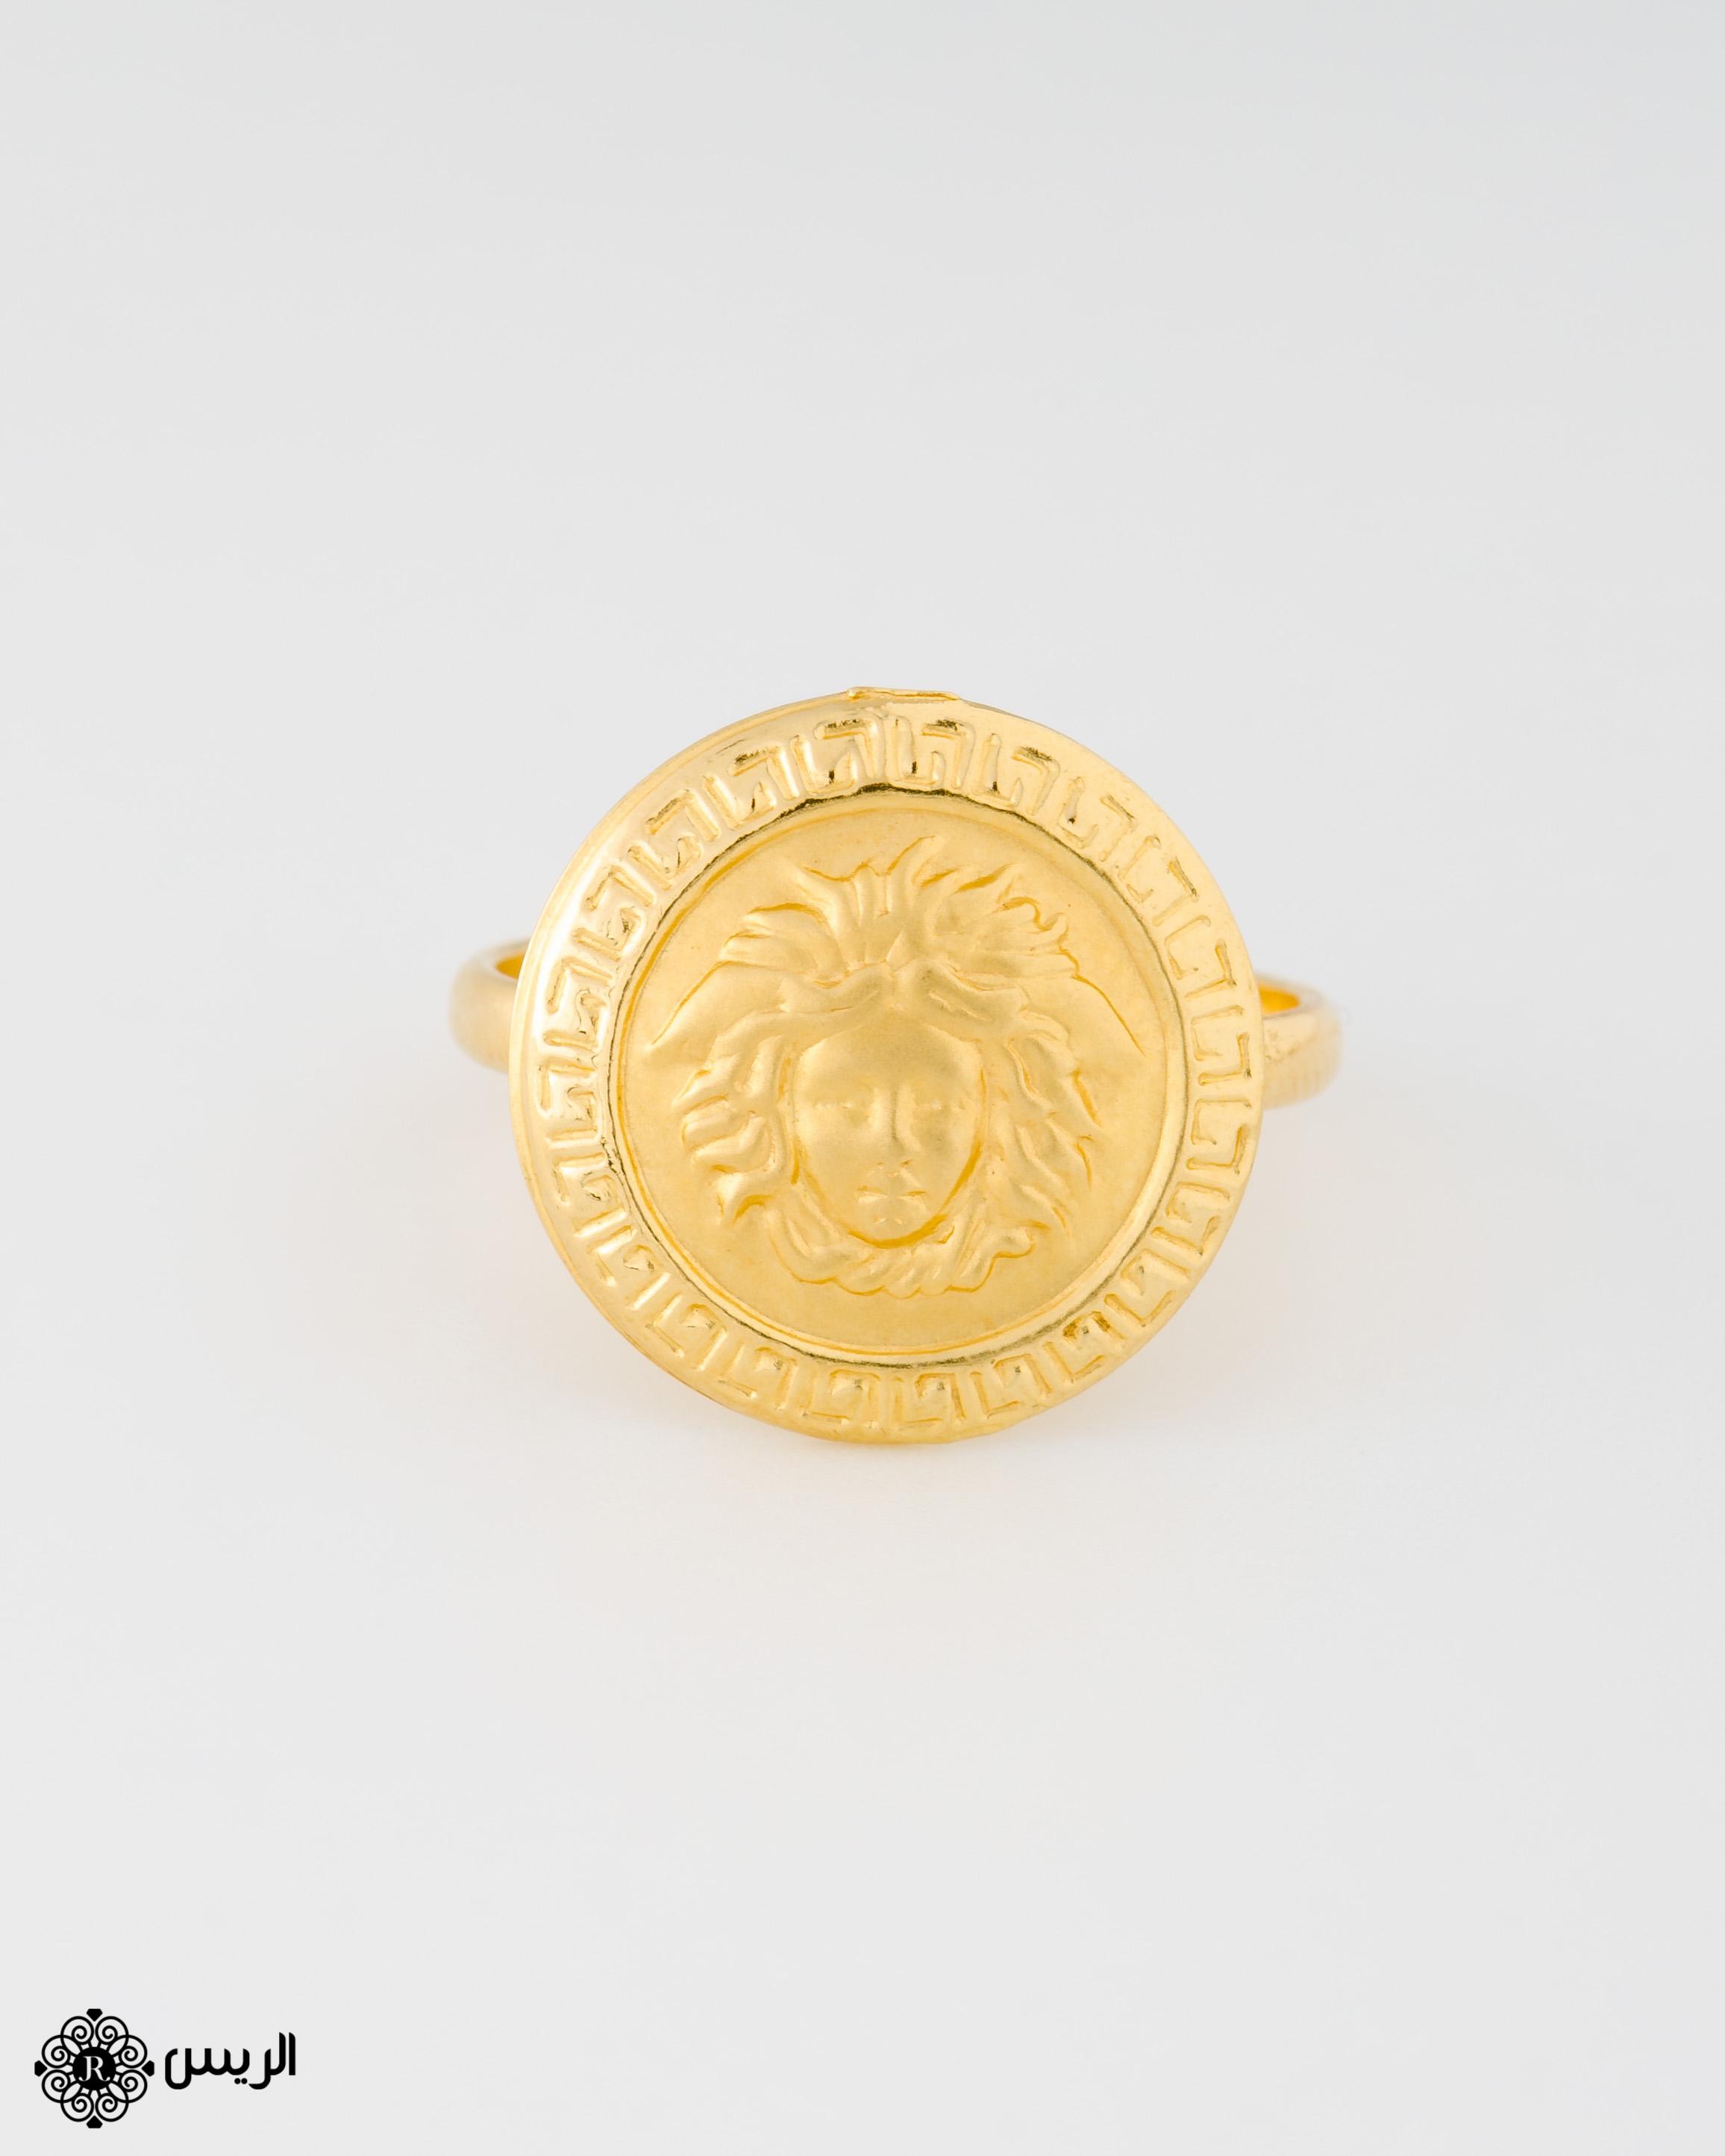 Raies jewelry Italian Ring خاتم تصميم إيطالي الريس للمجوهرات